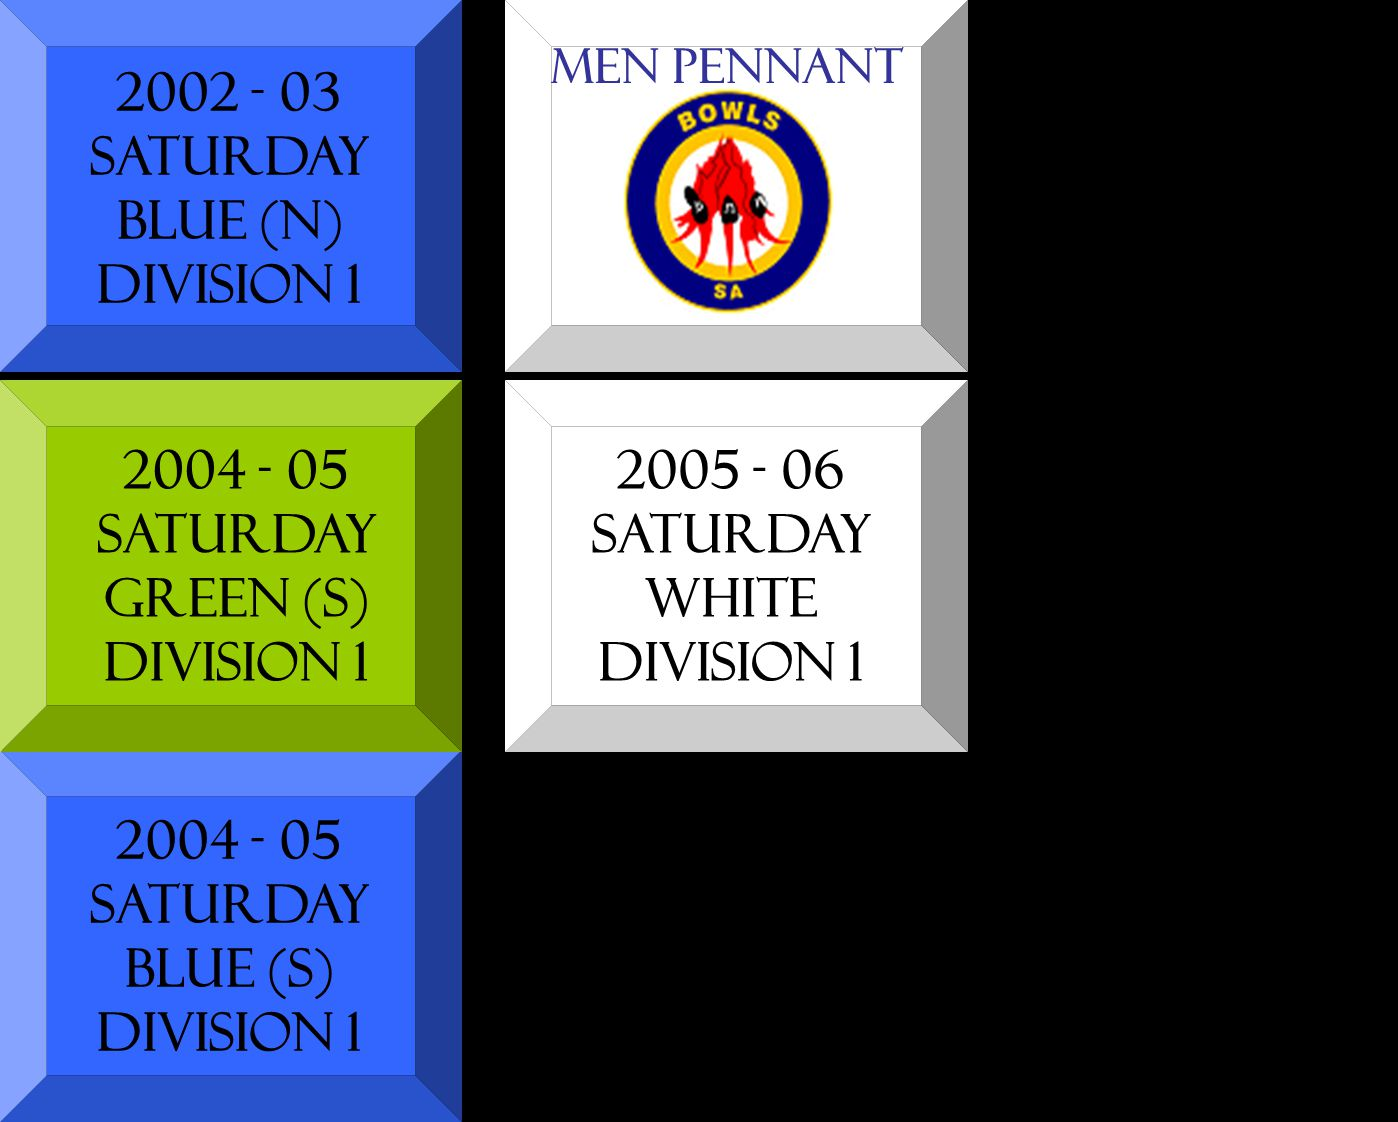 2002 - 03 SATURDAY BLUE (N) DIVISION 1 2004 - 05 SATURDAY GREEN (S) DIVISION 1 2004 - 05 SATURDAY BLUE (S) DIVISION 1 2005 - 06 SATURDAY WHITE DIVISIO